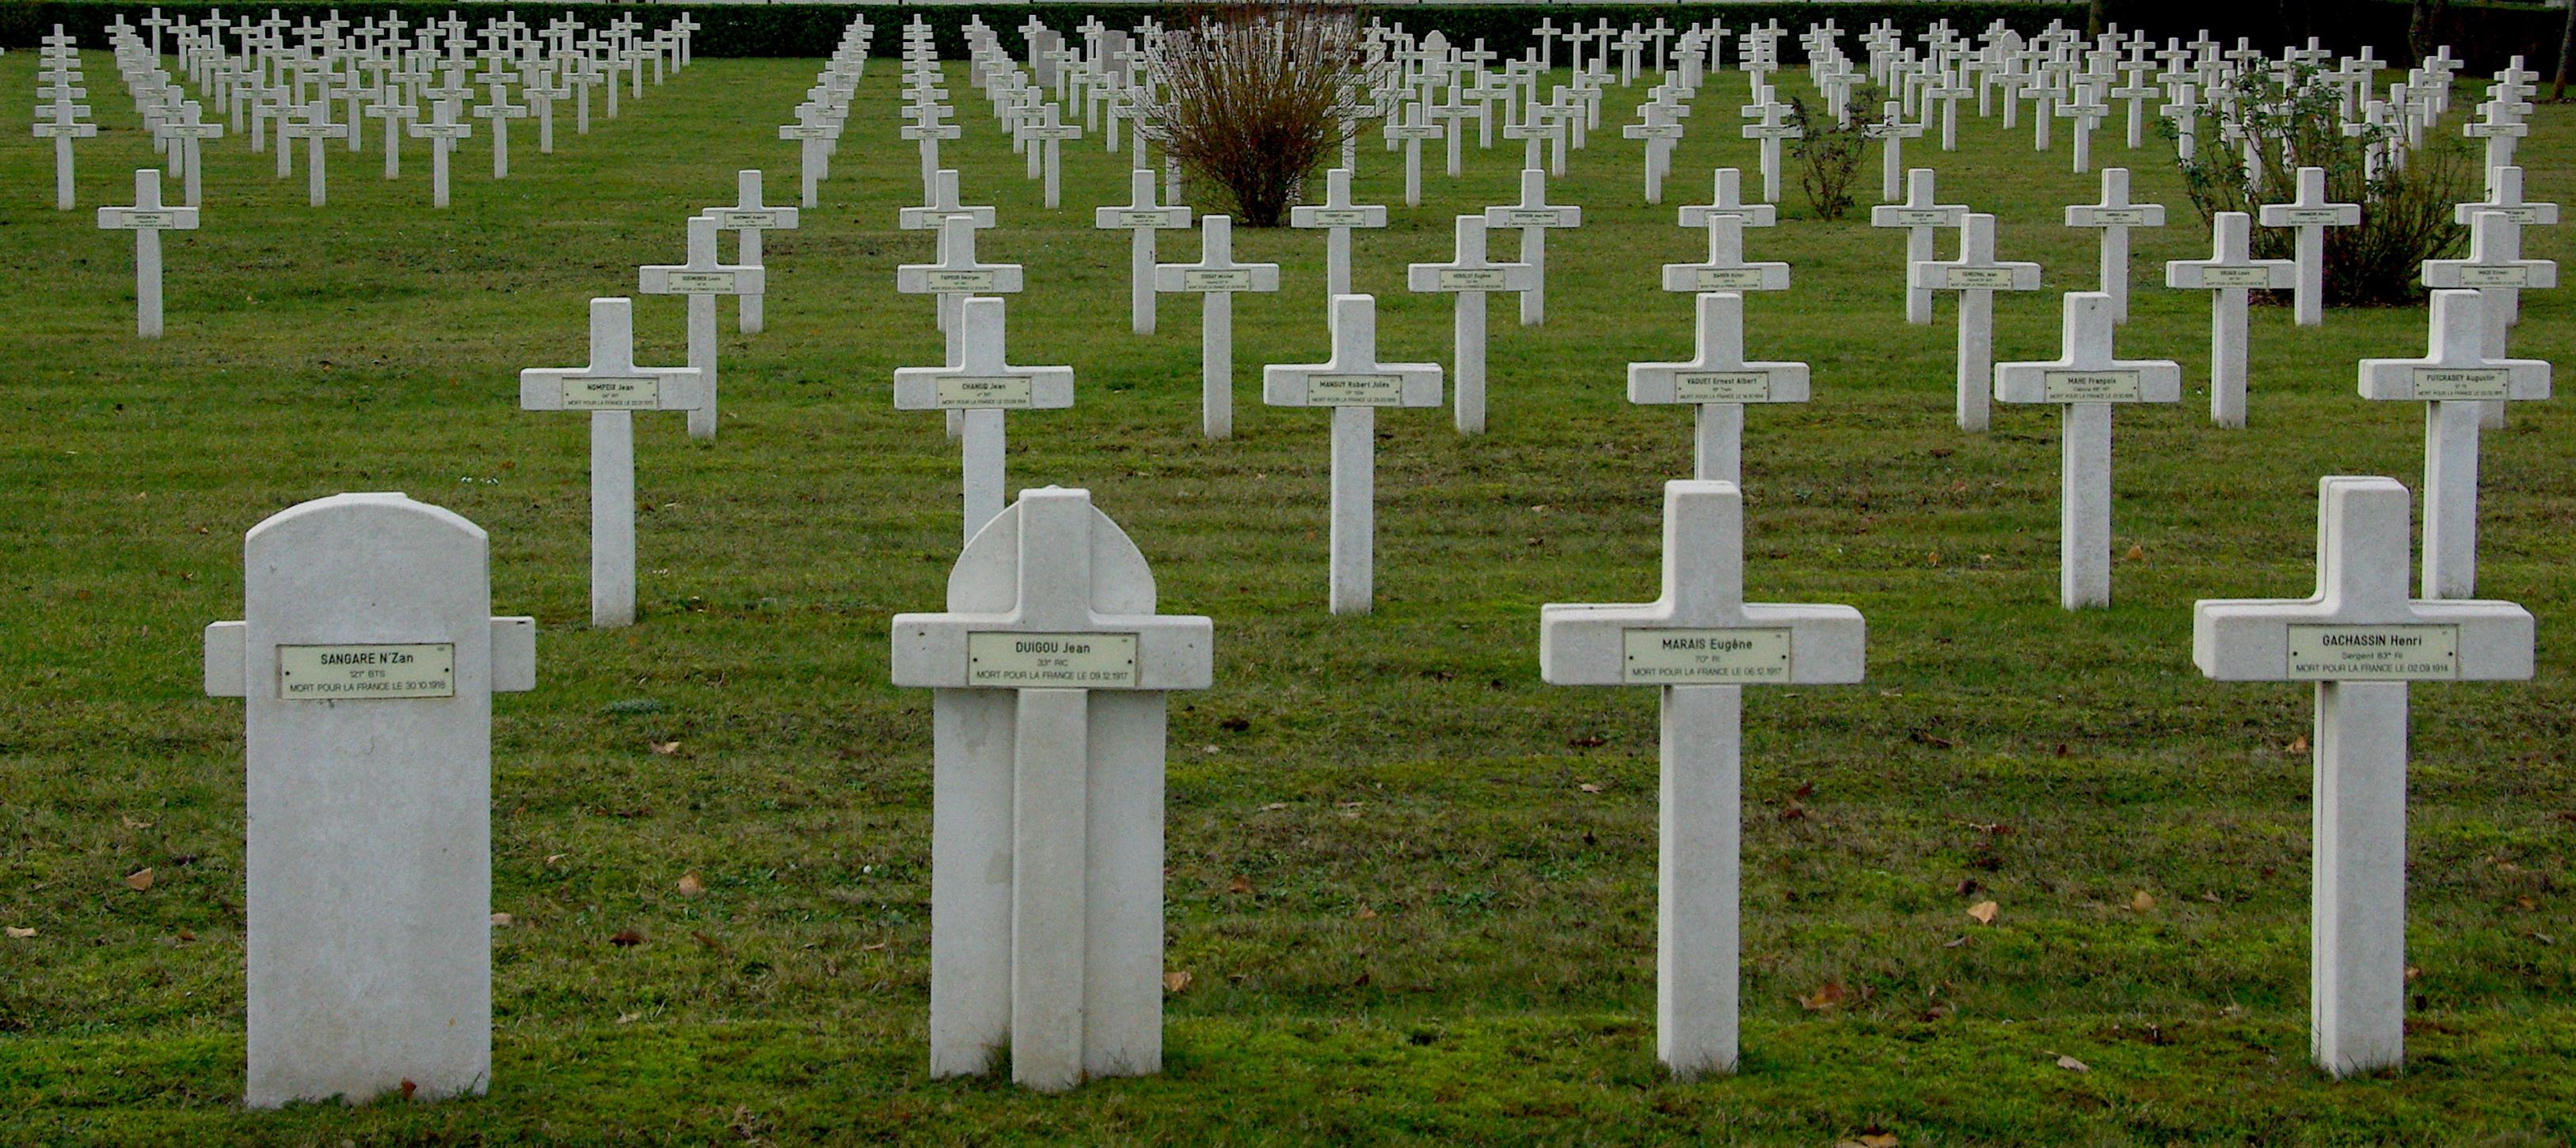 2011-12-24_15-59-50_-_VLF_Hommage_a_nos_morts.JPG